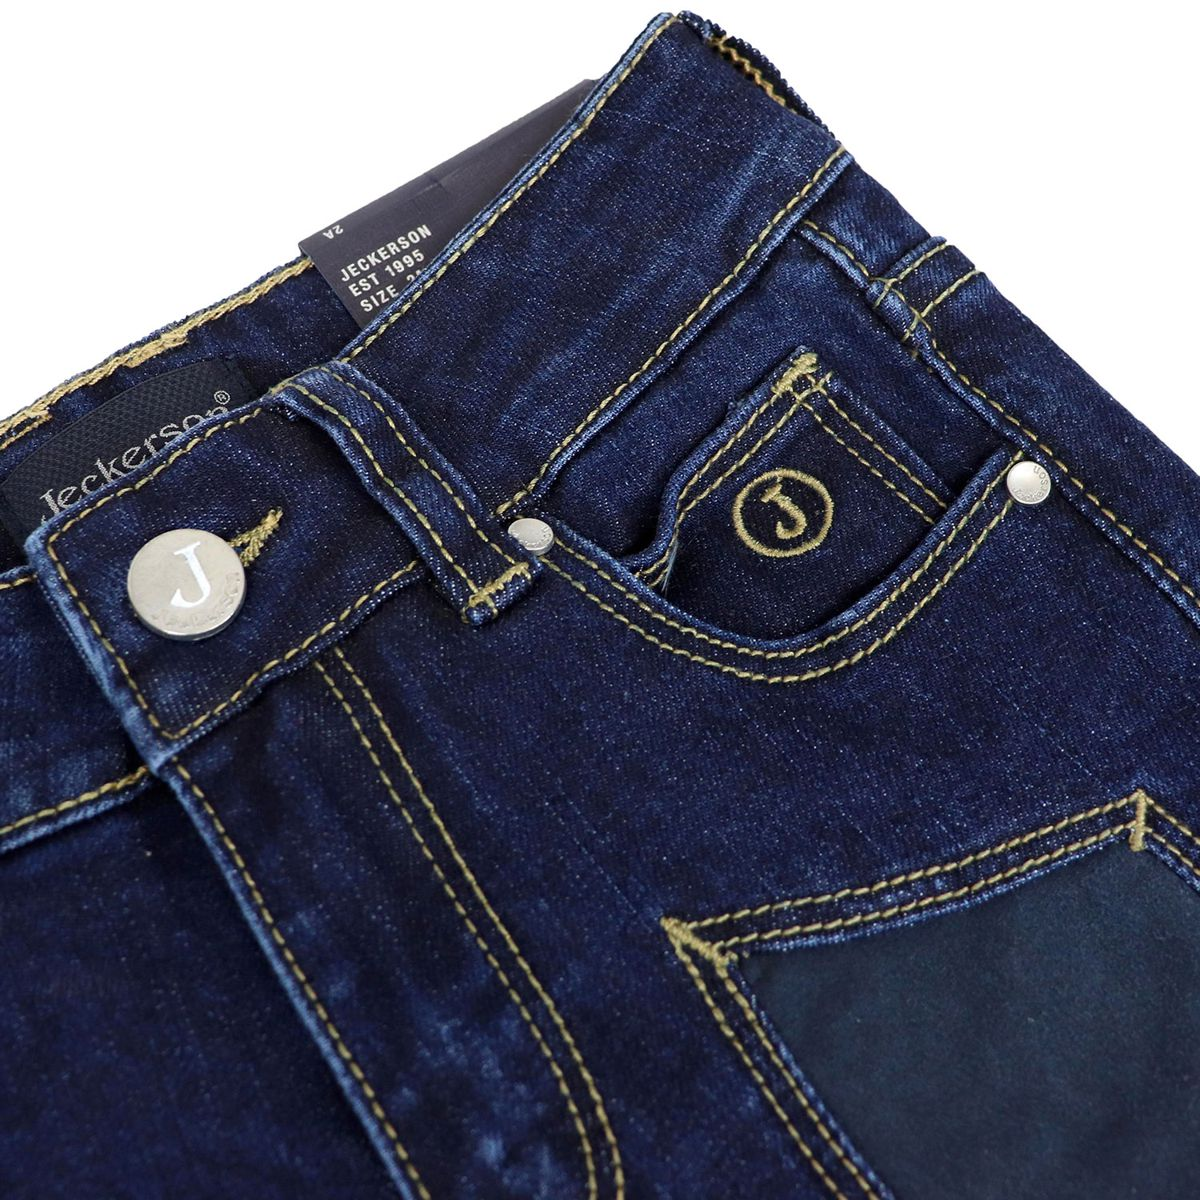 5 pocket jeans with alcantara patches Blue denim Jeckerson